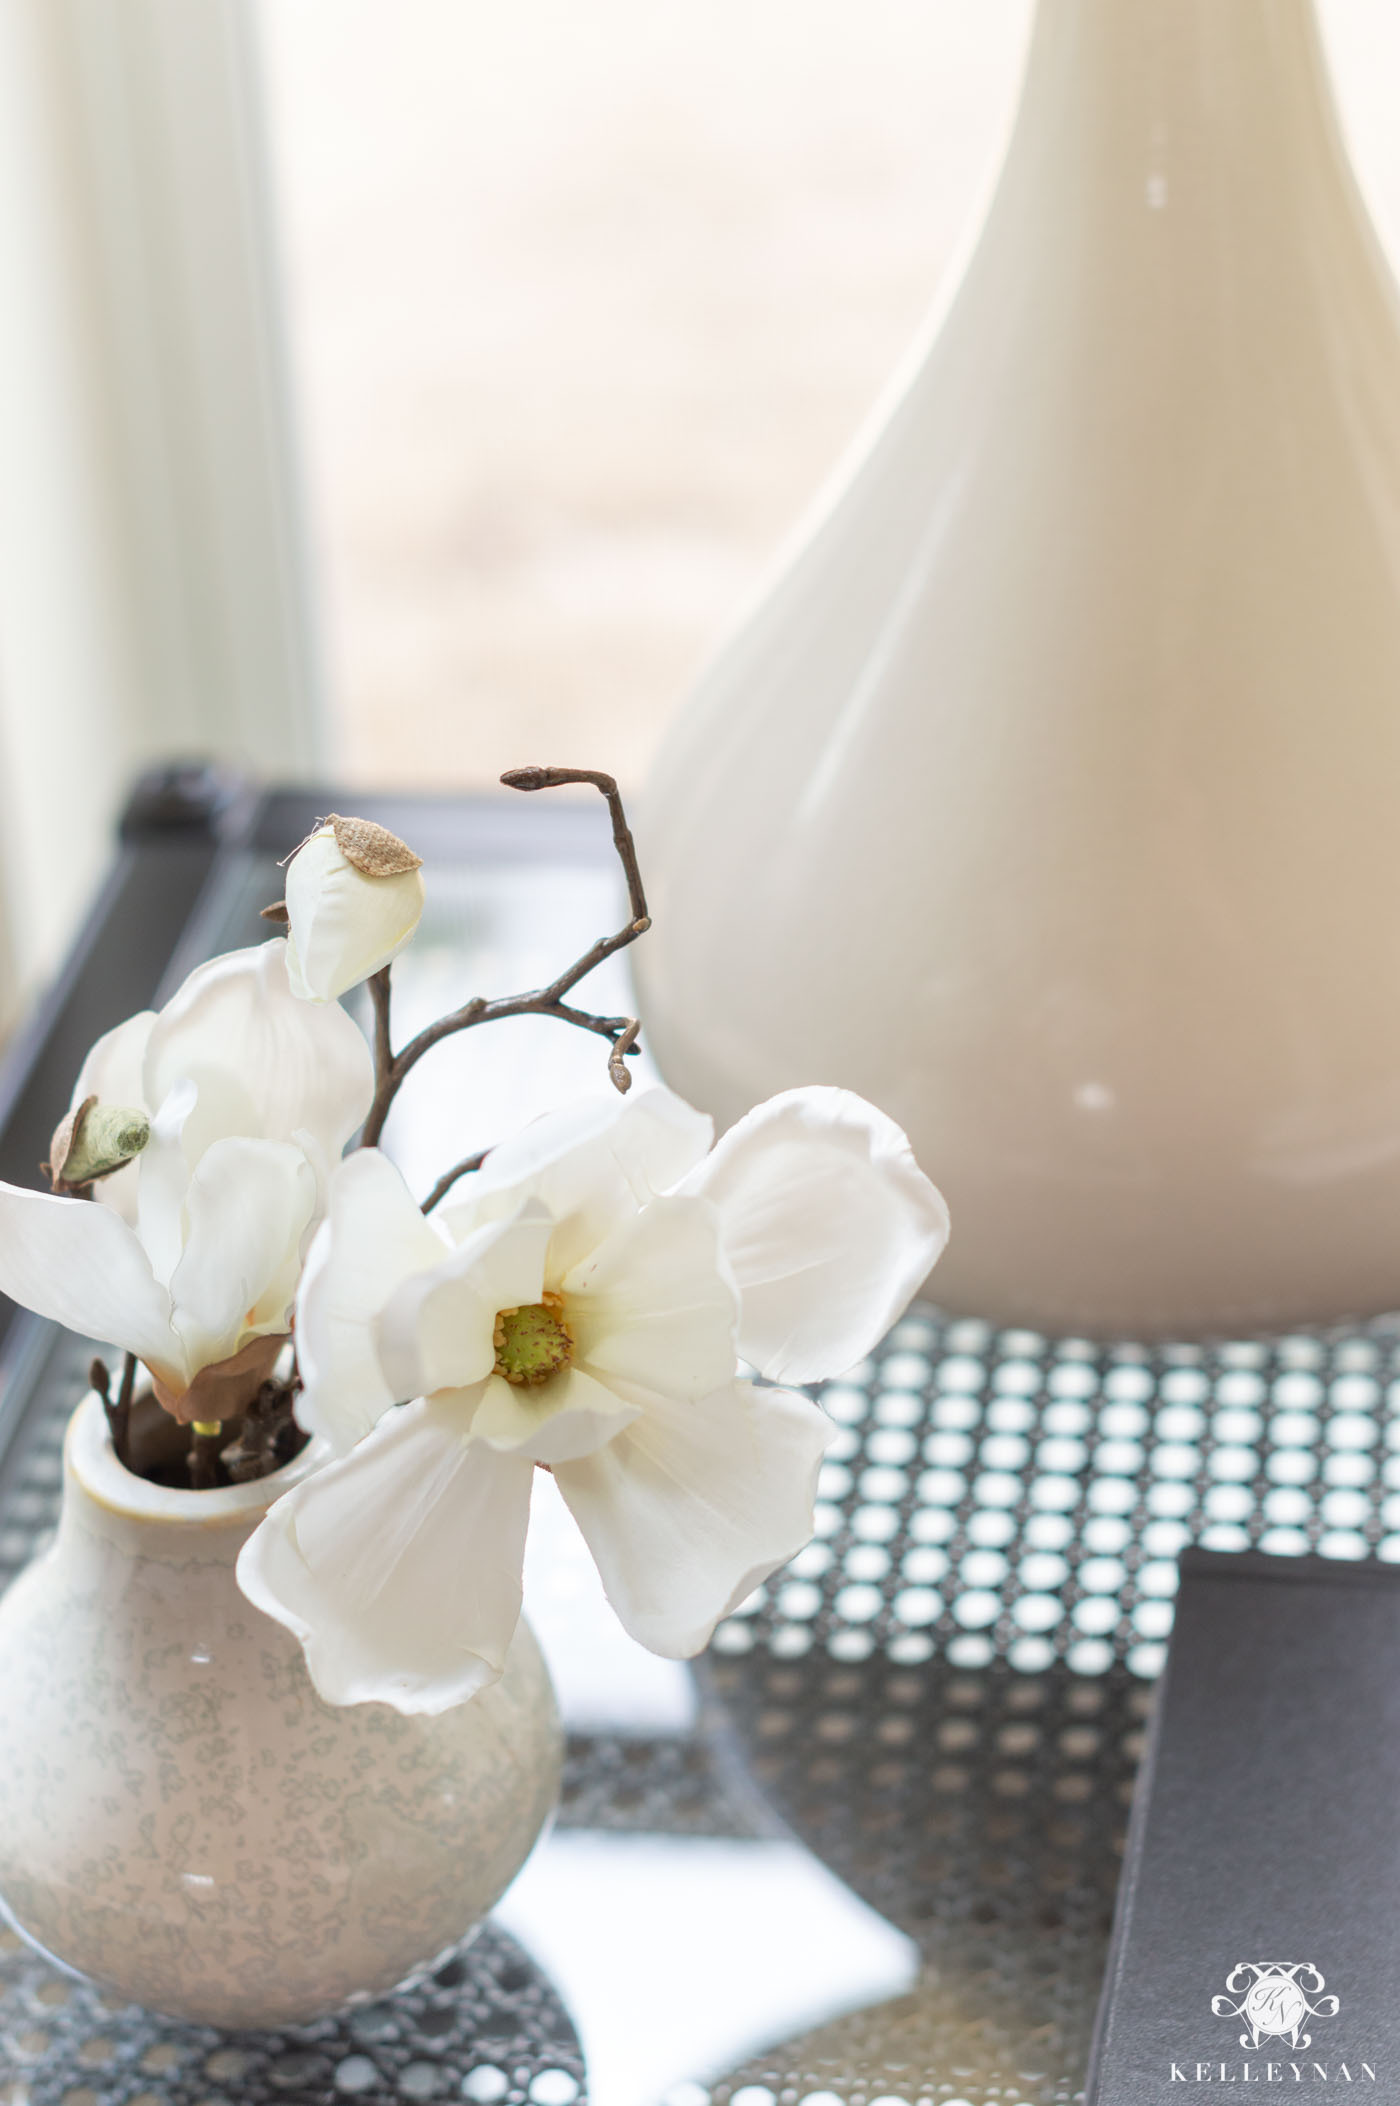 Favorite Faux Flowers and Simple Arrangements